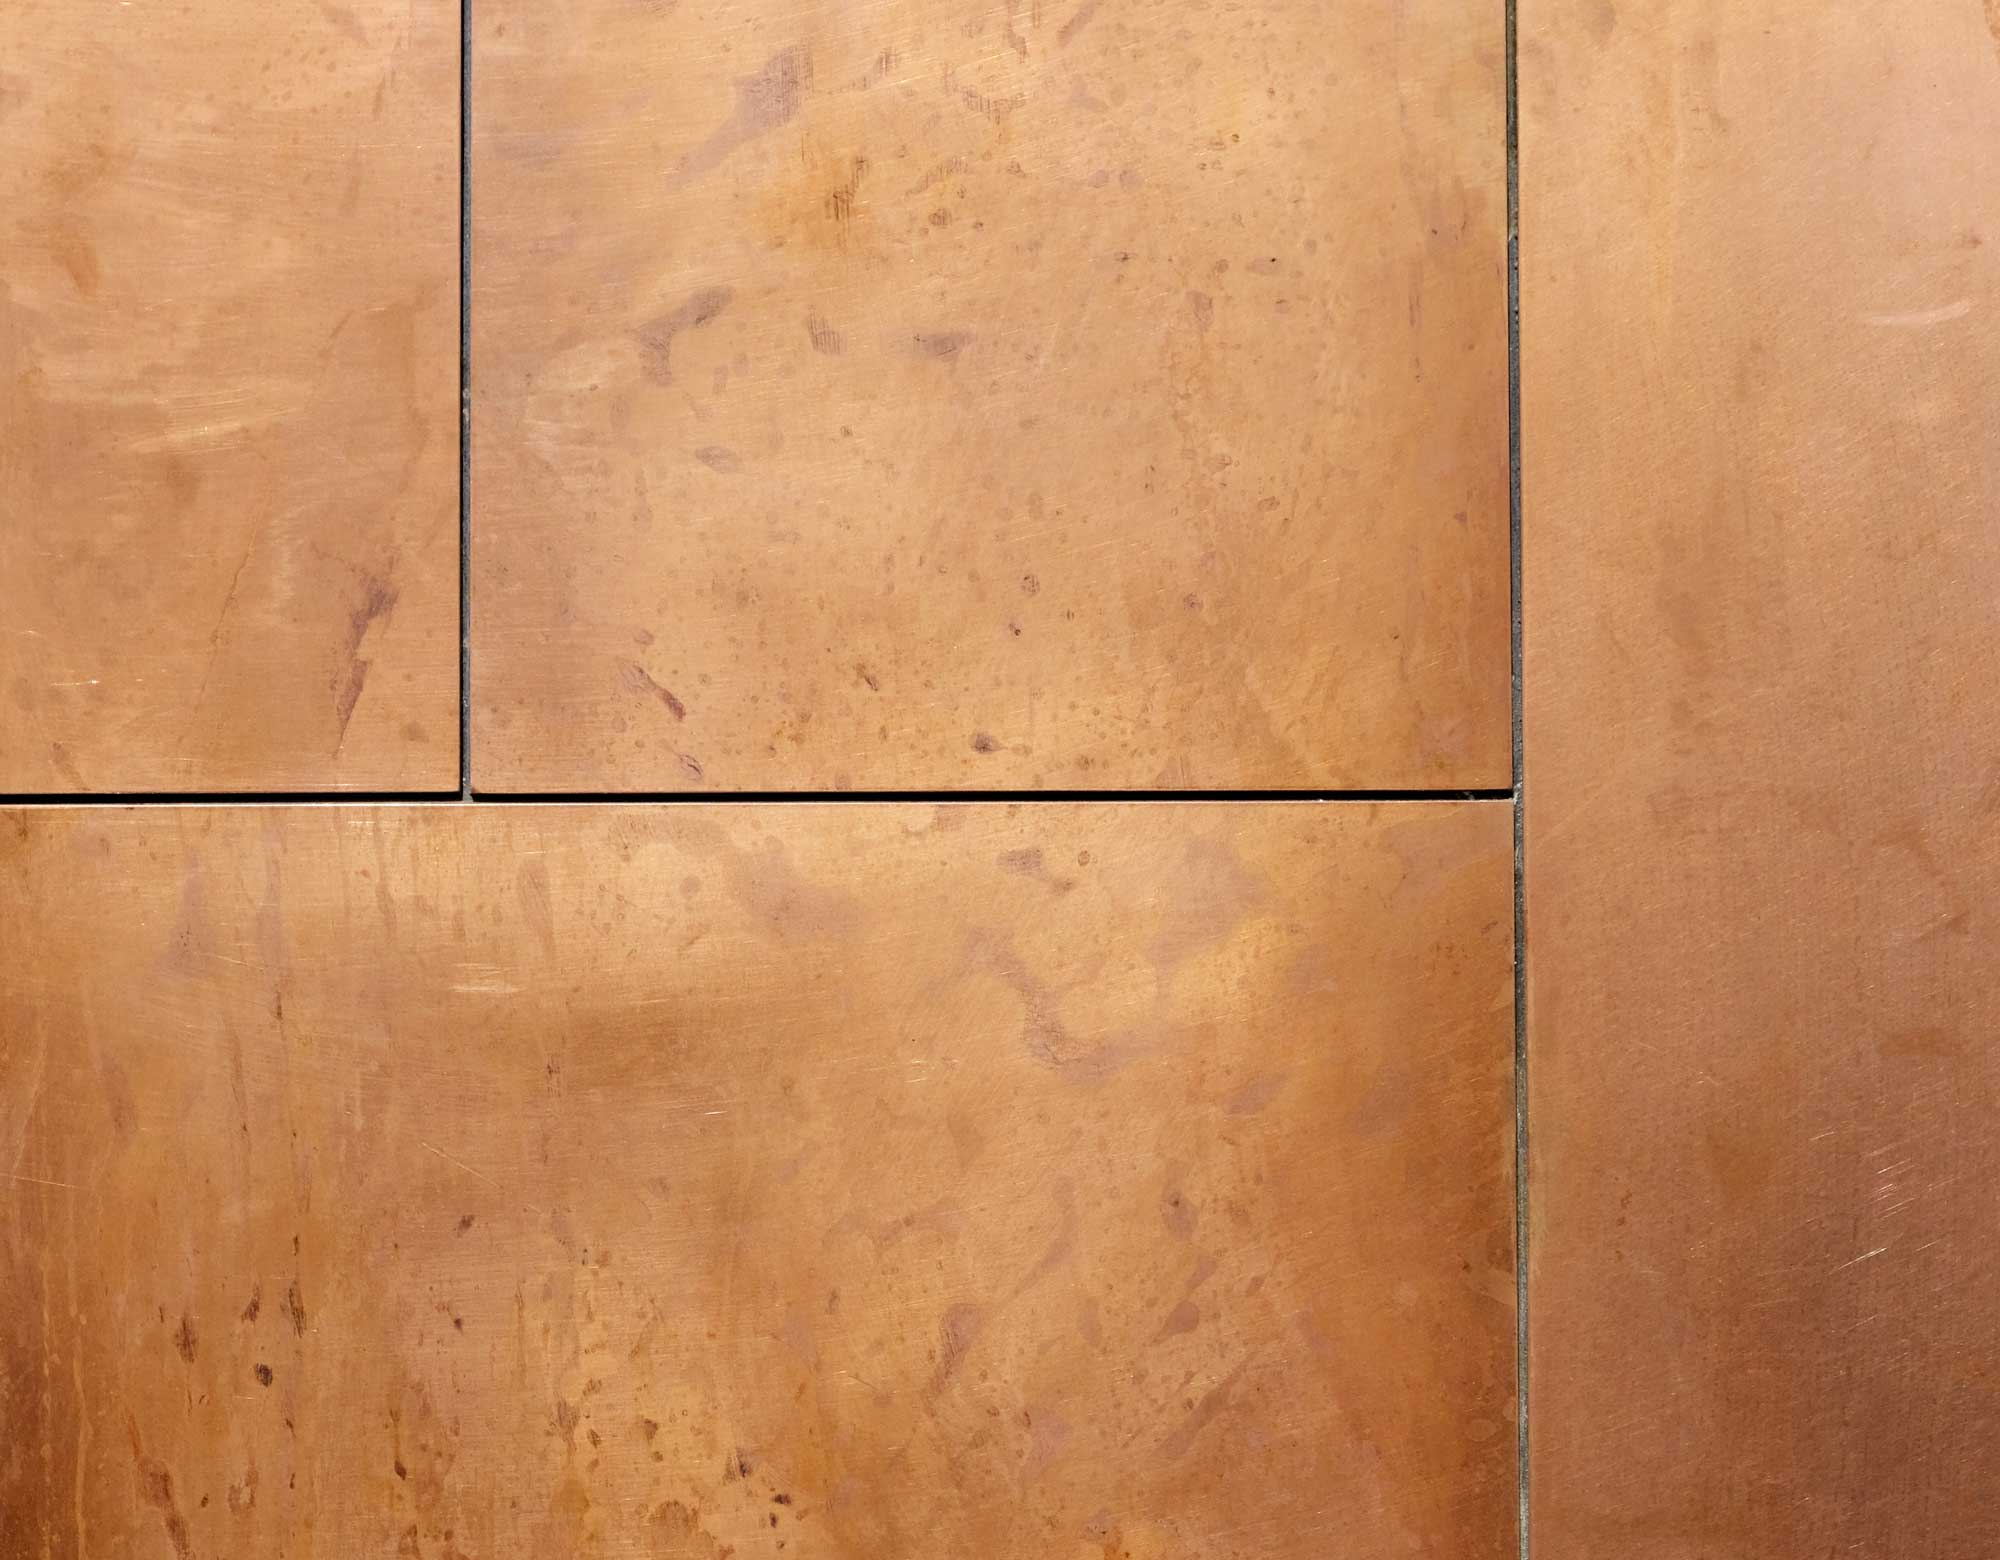 wandpaneele-metall-kupfer-oxidiert-mit-patina-plattenbau-g